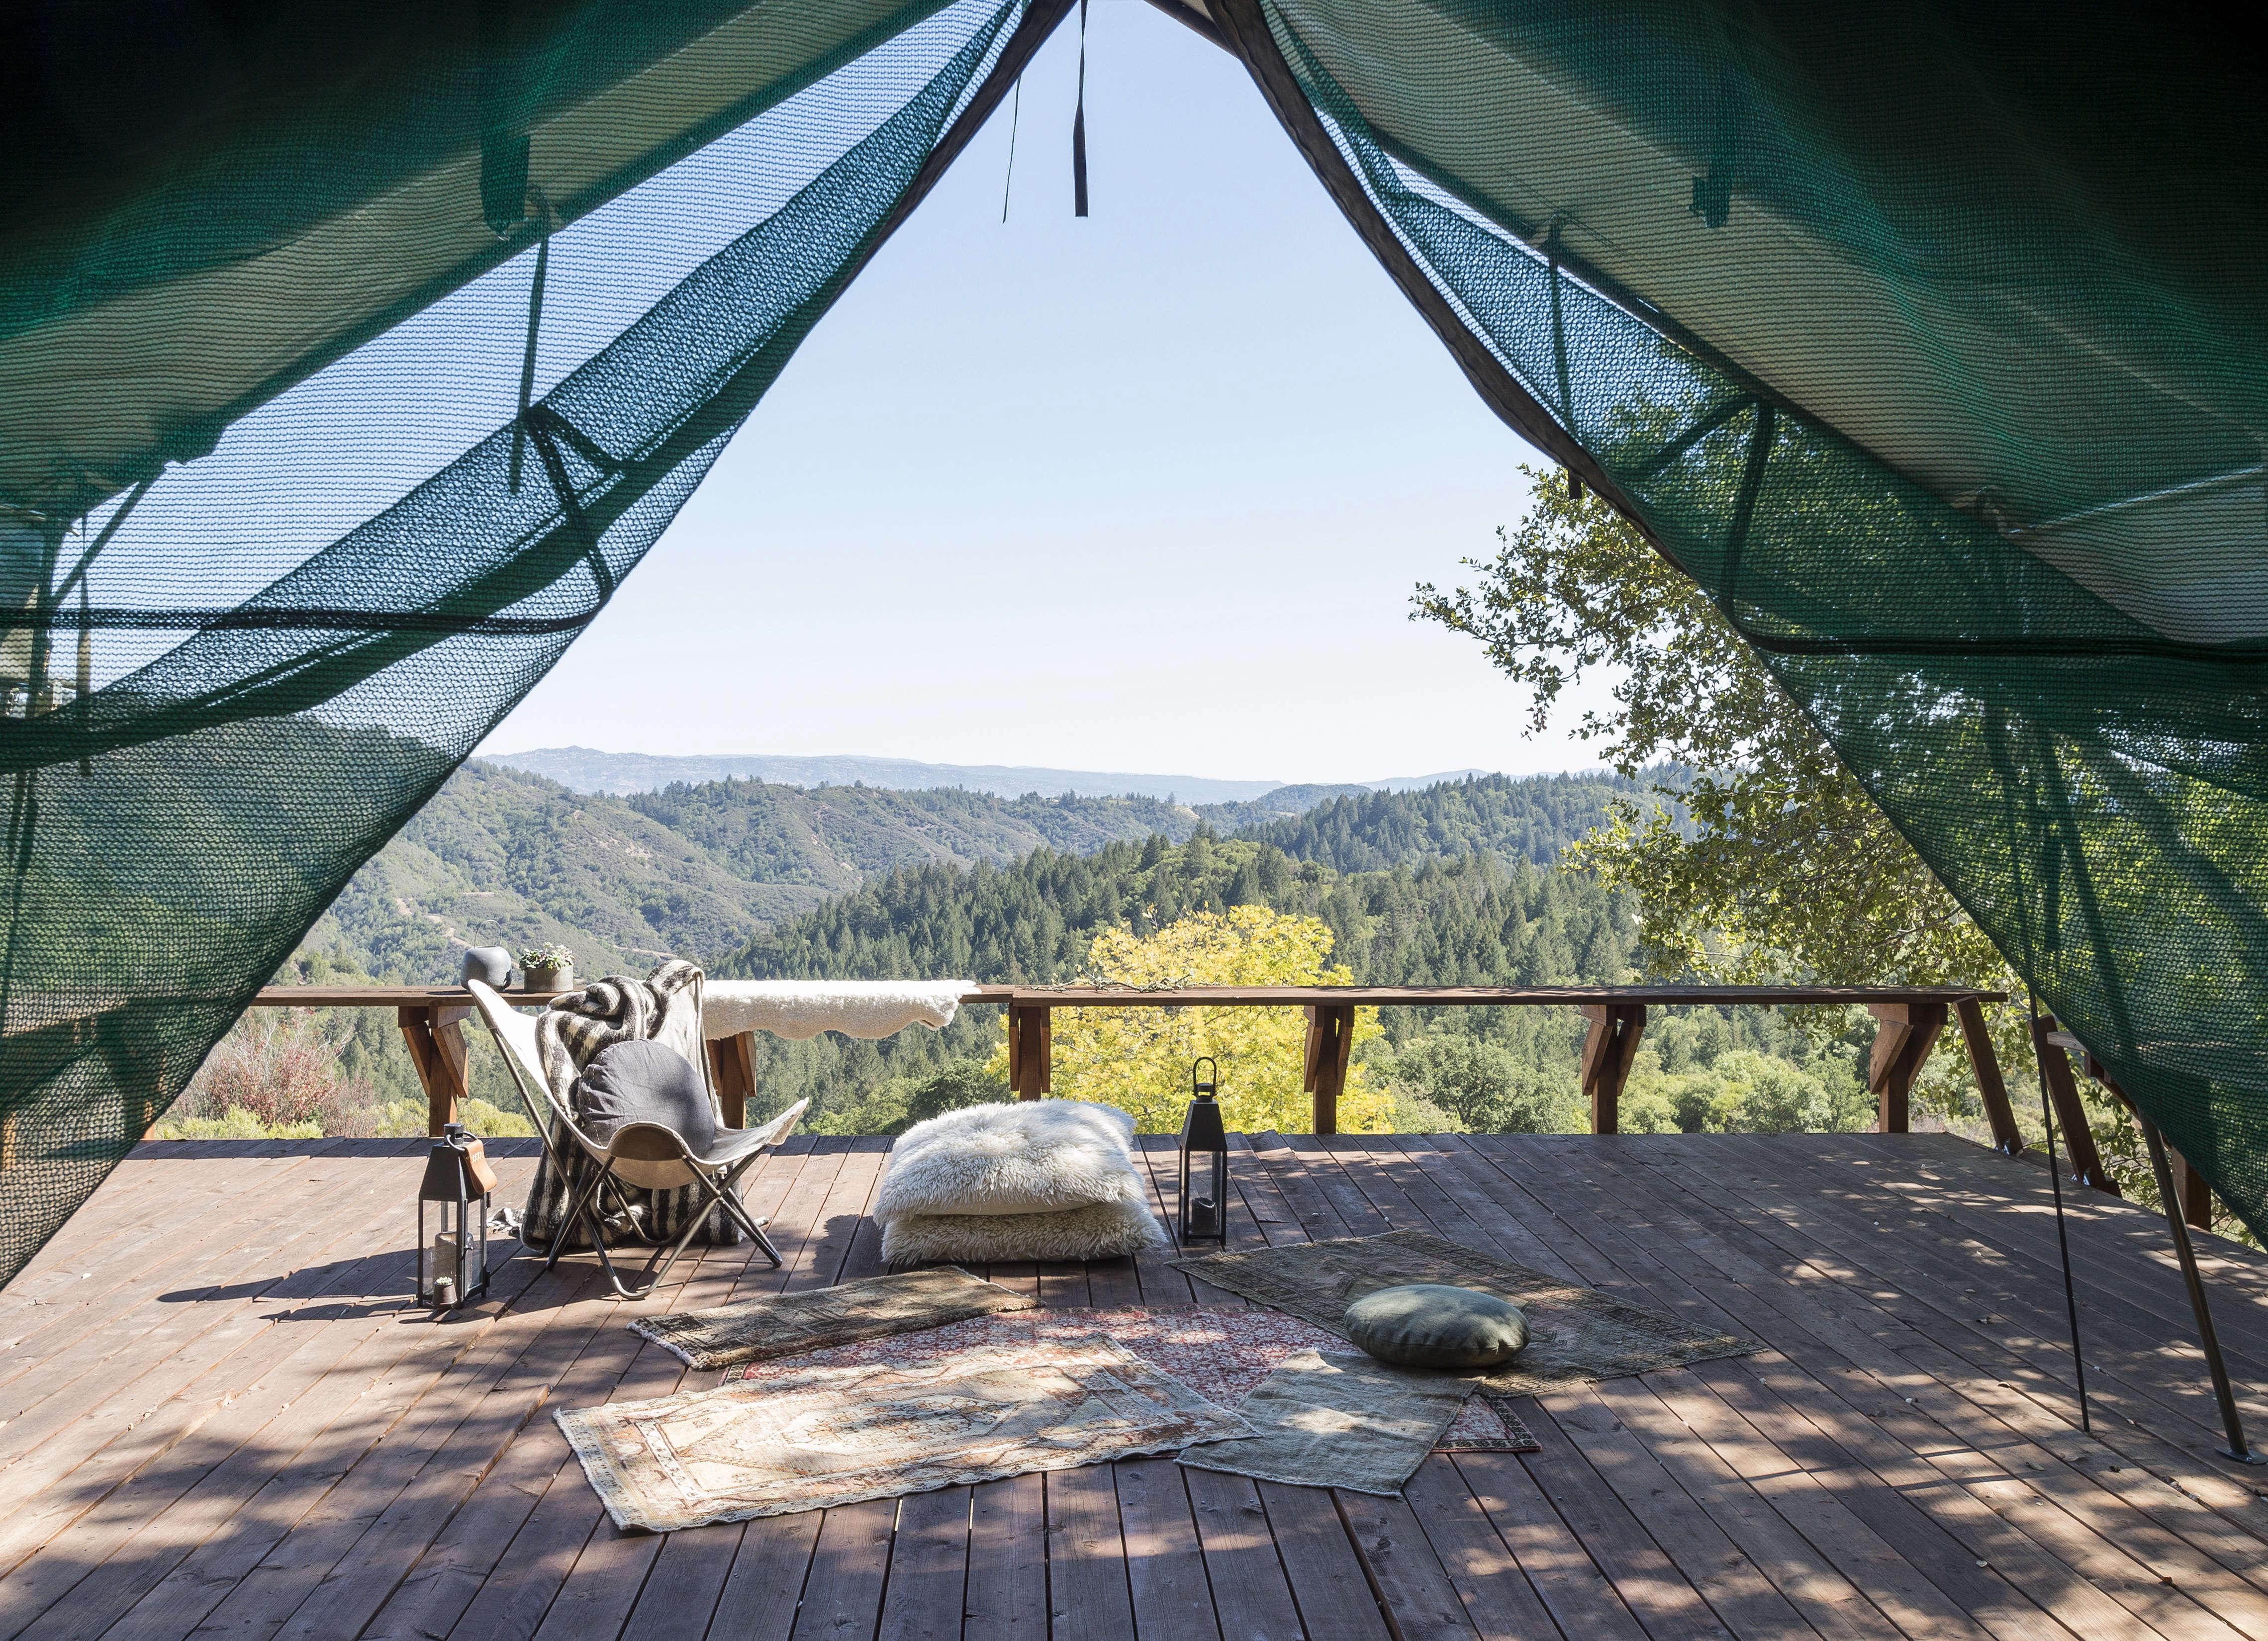 outdoor-rugs-napa-glamping-tent-matthew-williams-dsc-1842